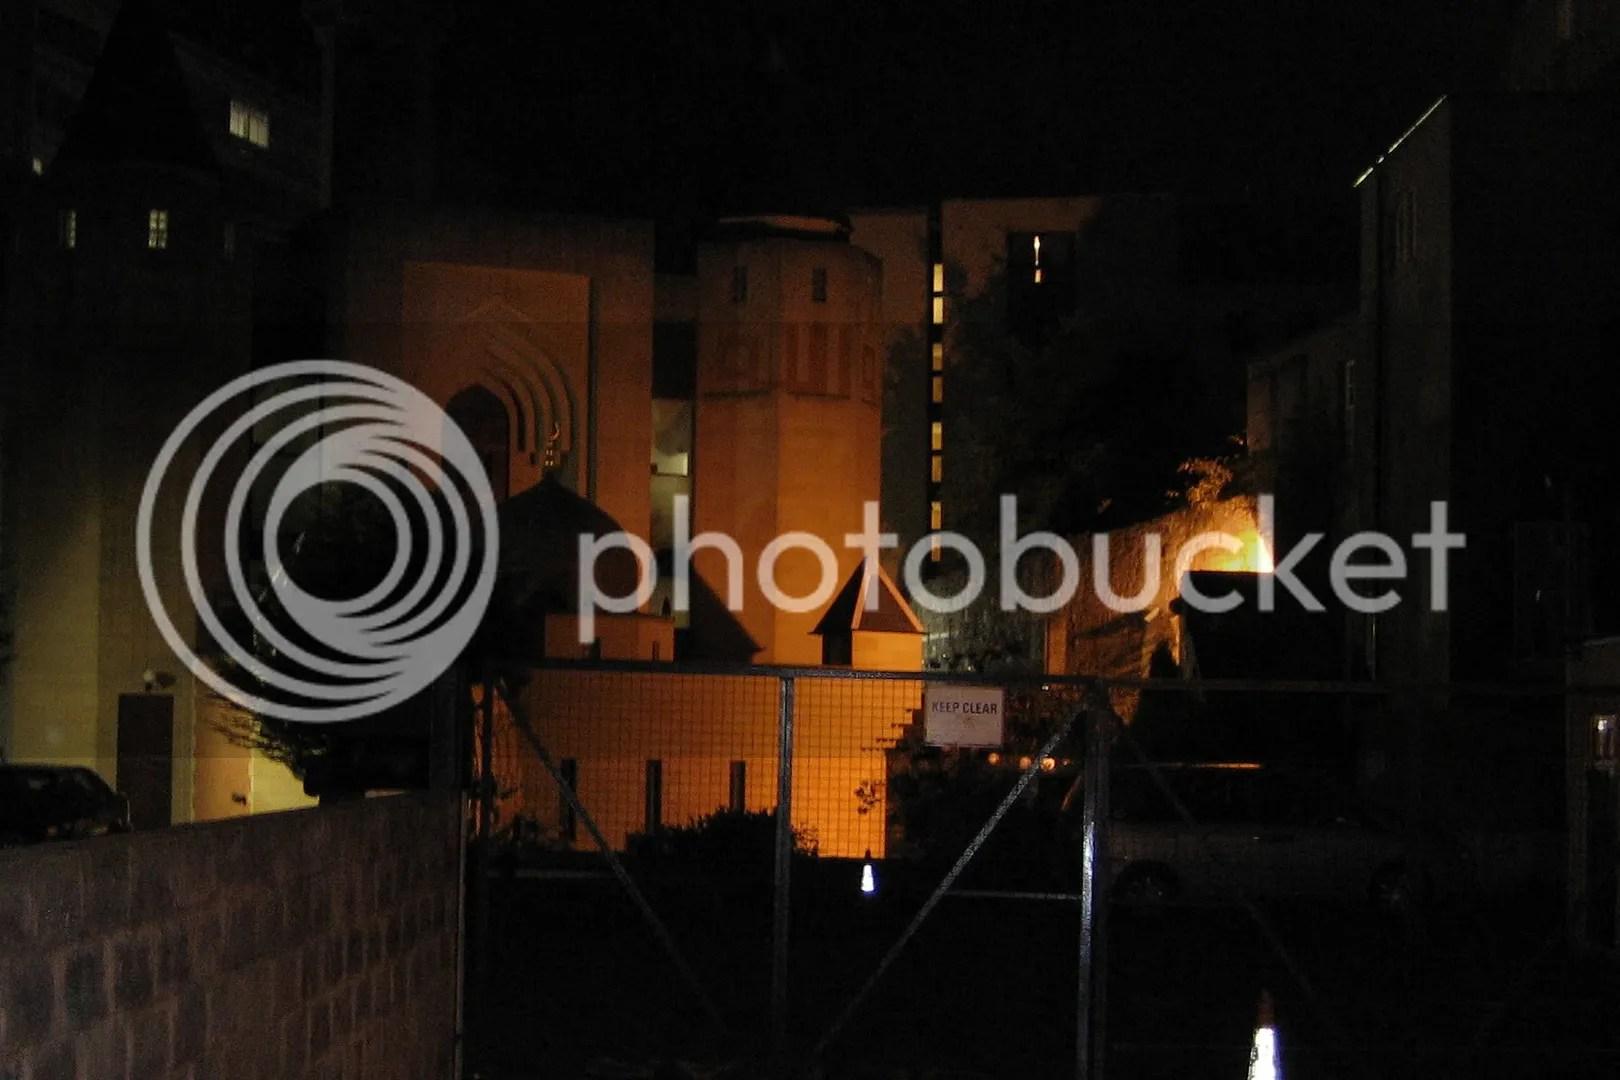 Edinburgh mosque at night